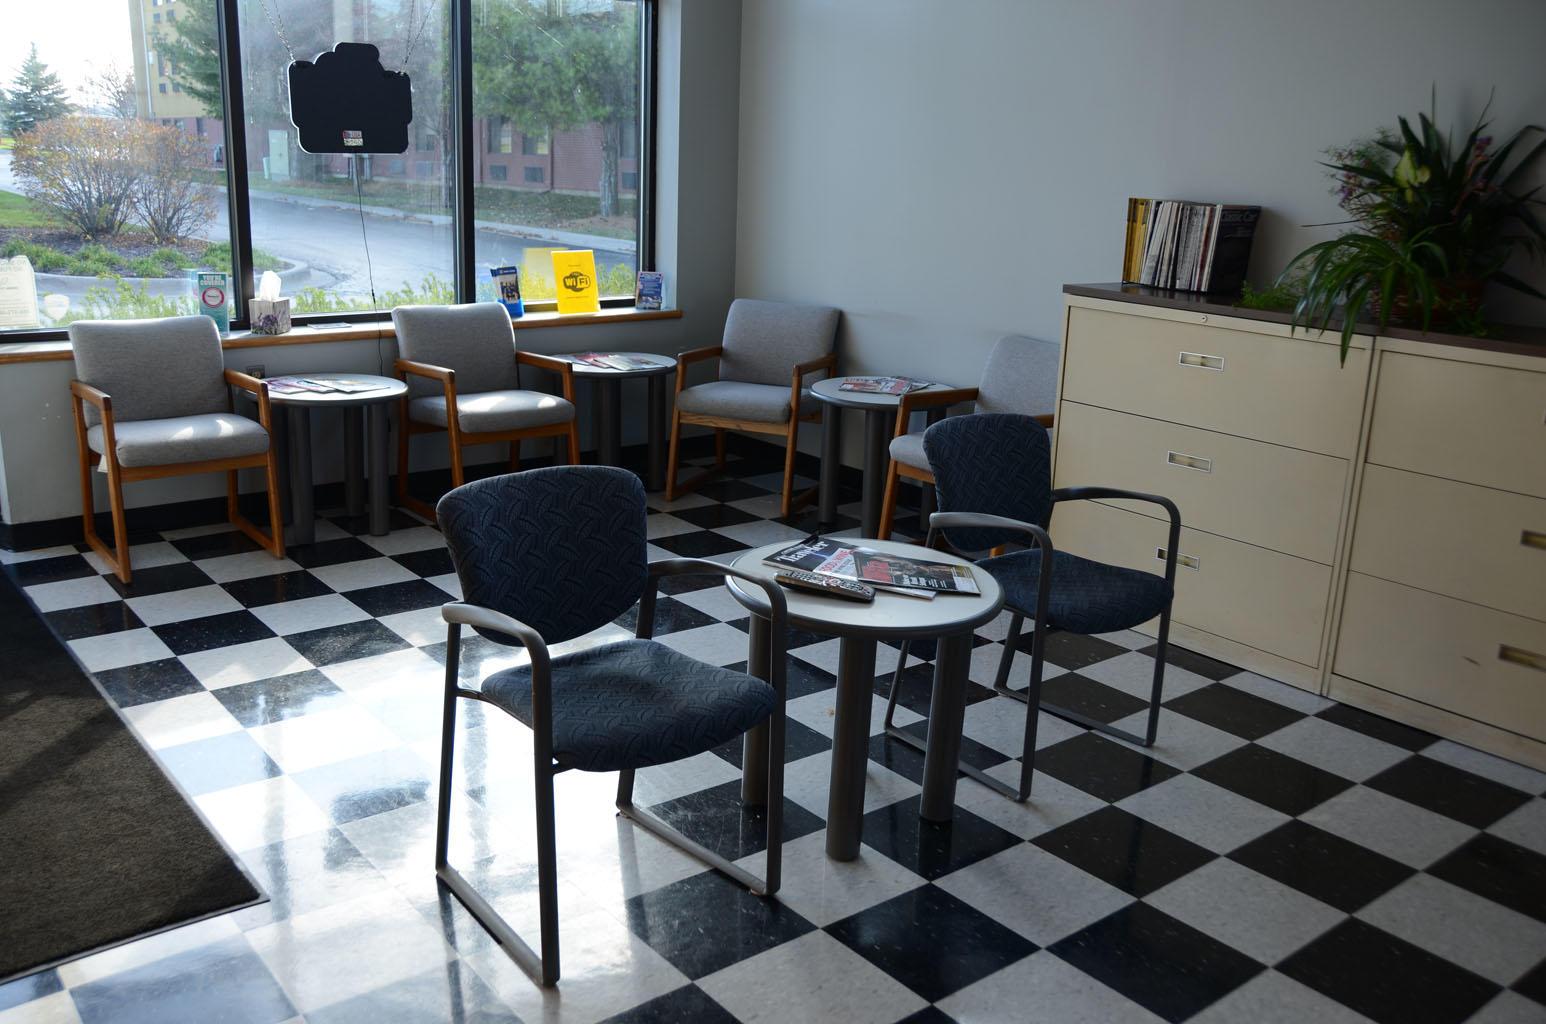 Bartel's Auto Clinic image 7